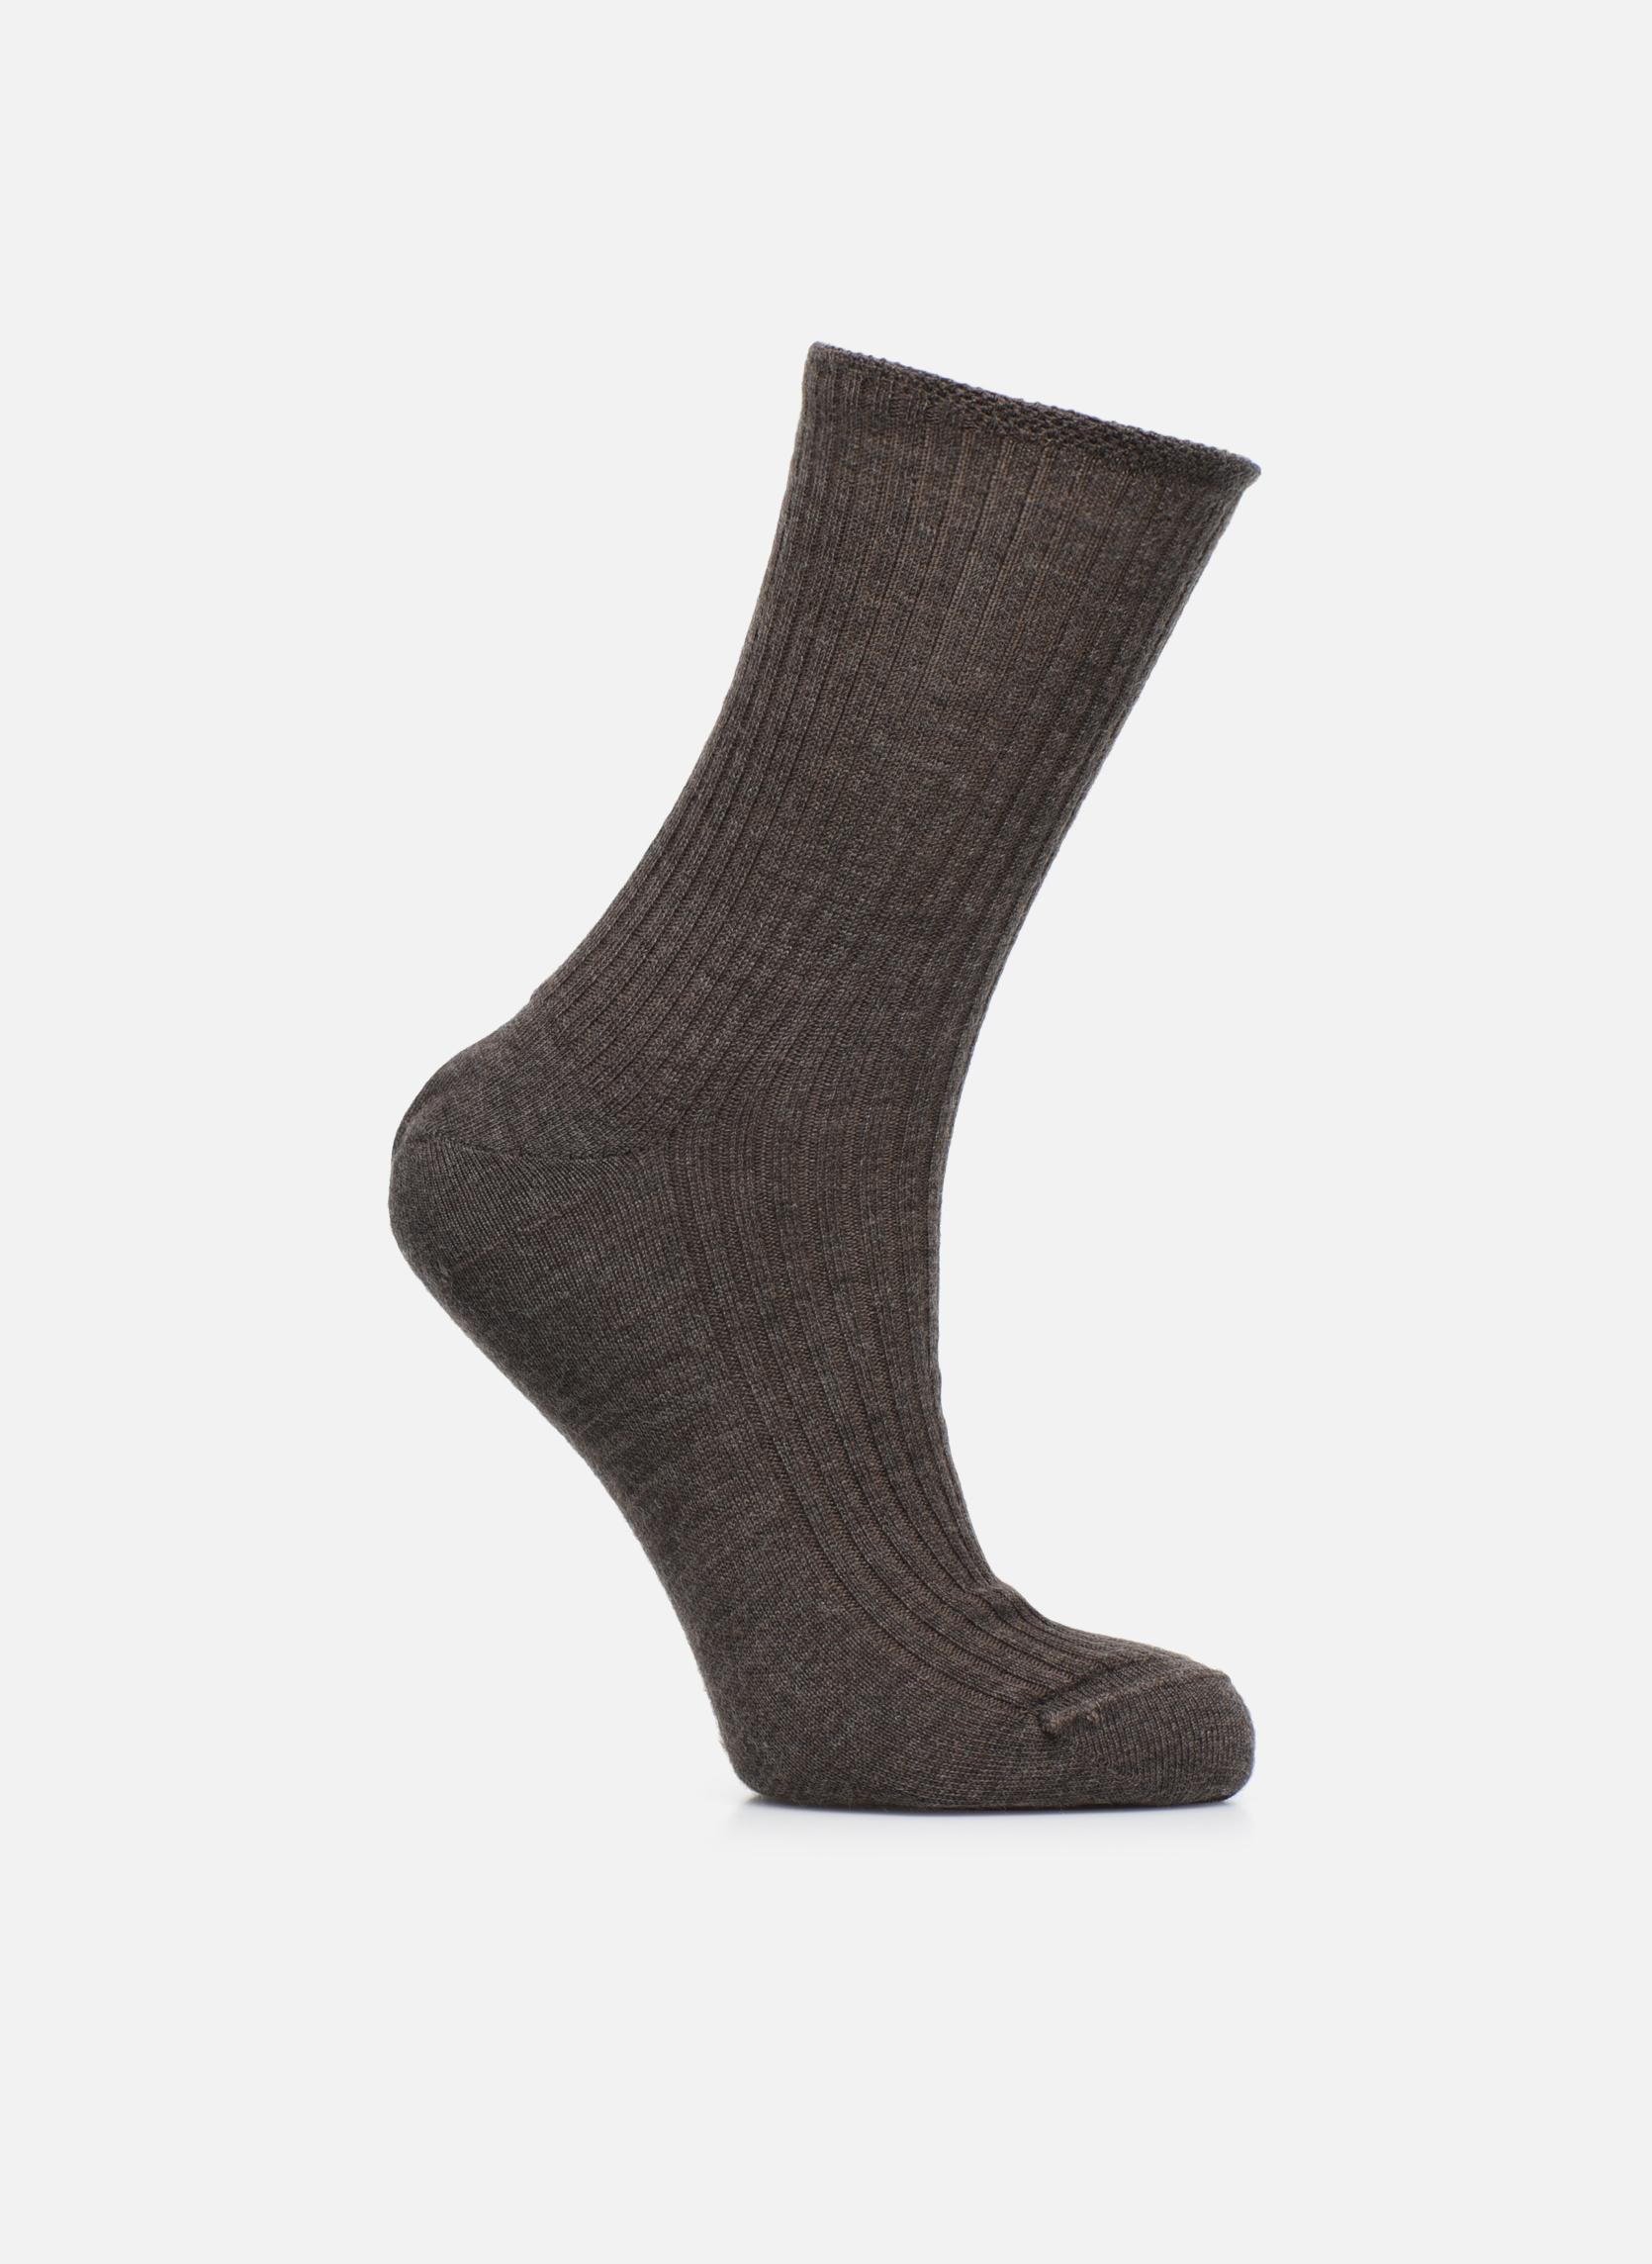 Socken & Strumpfhosen Accessoires Socken INSÉPARABLE